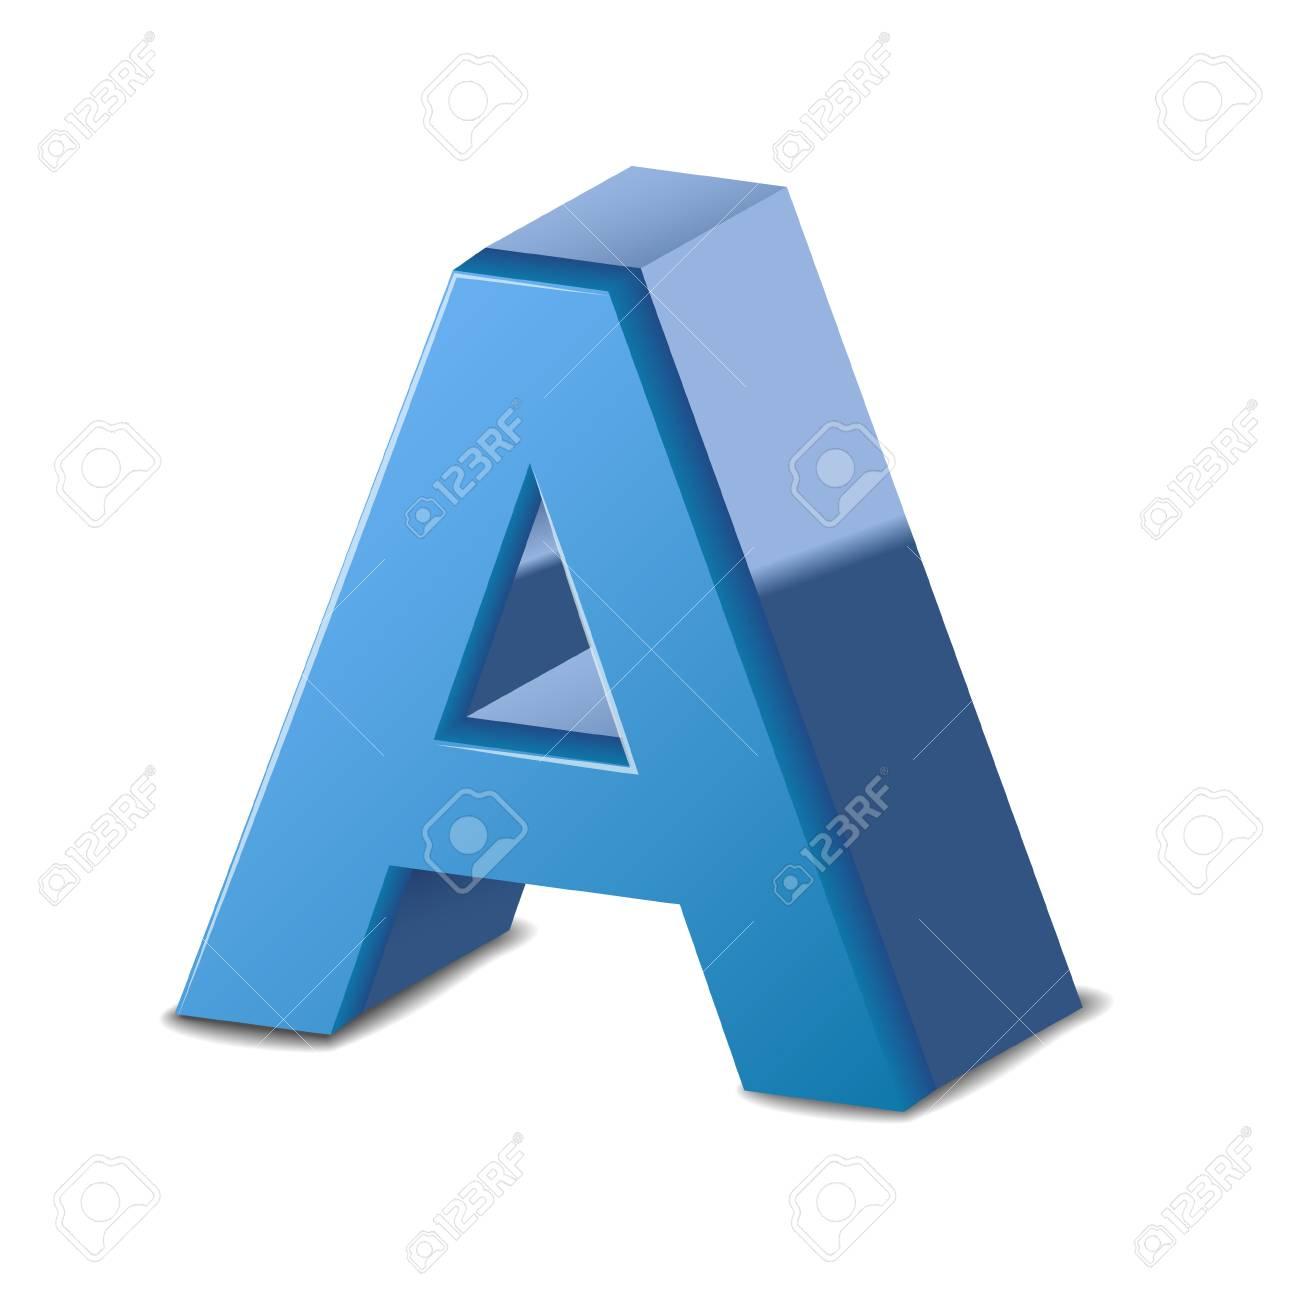 letter a blue - Monza berglauf-verband com